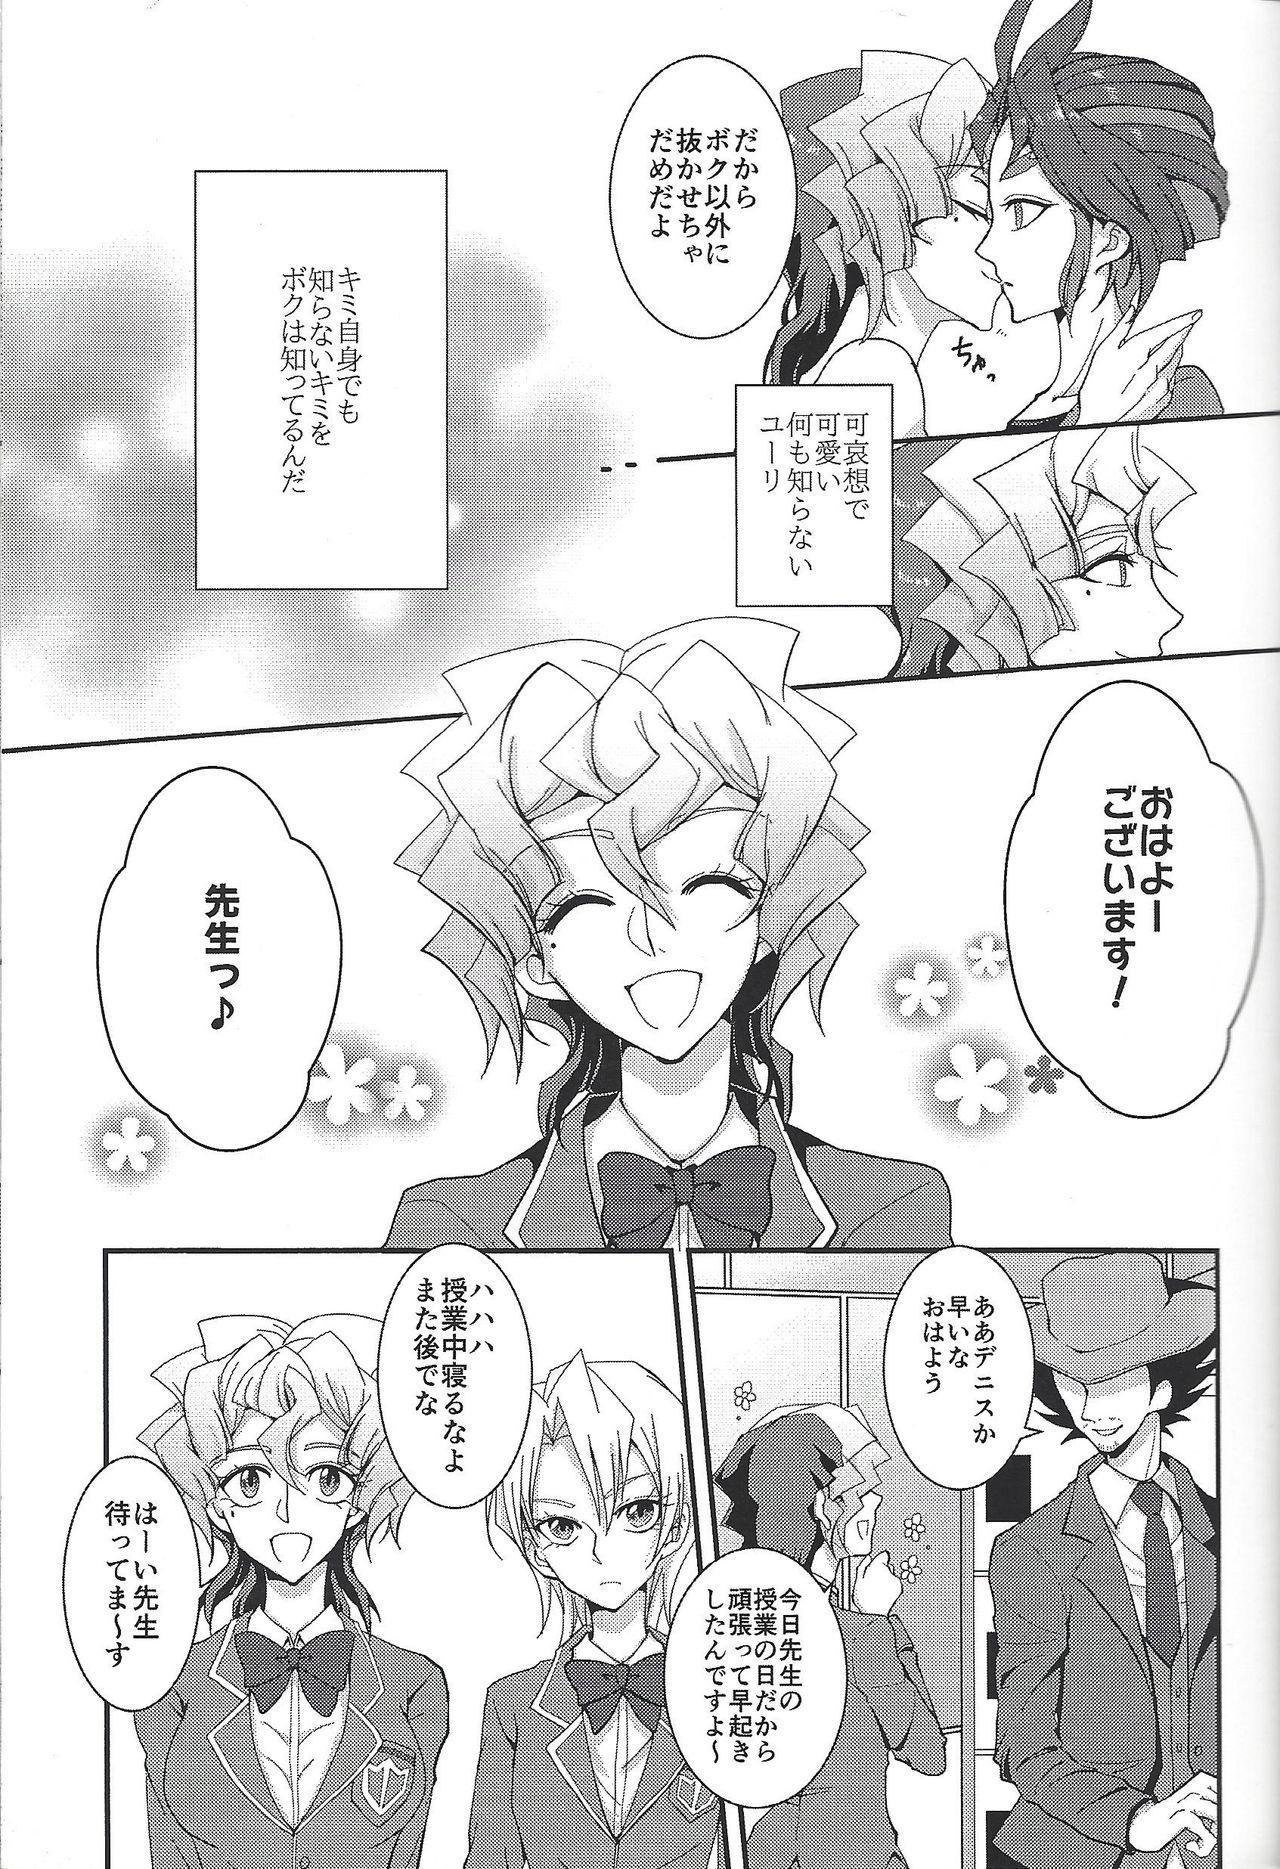 Saitei na Koi o Shiyou 7